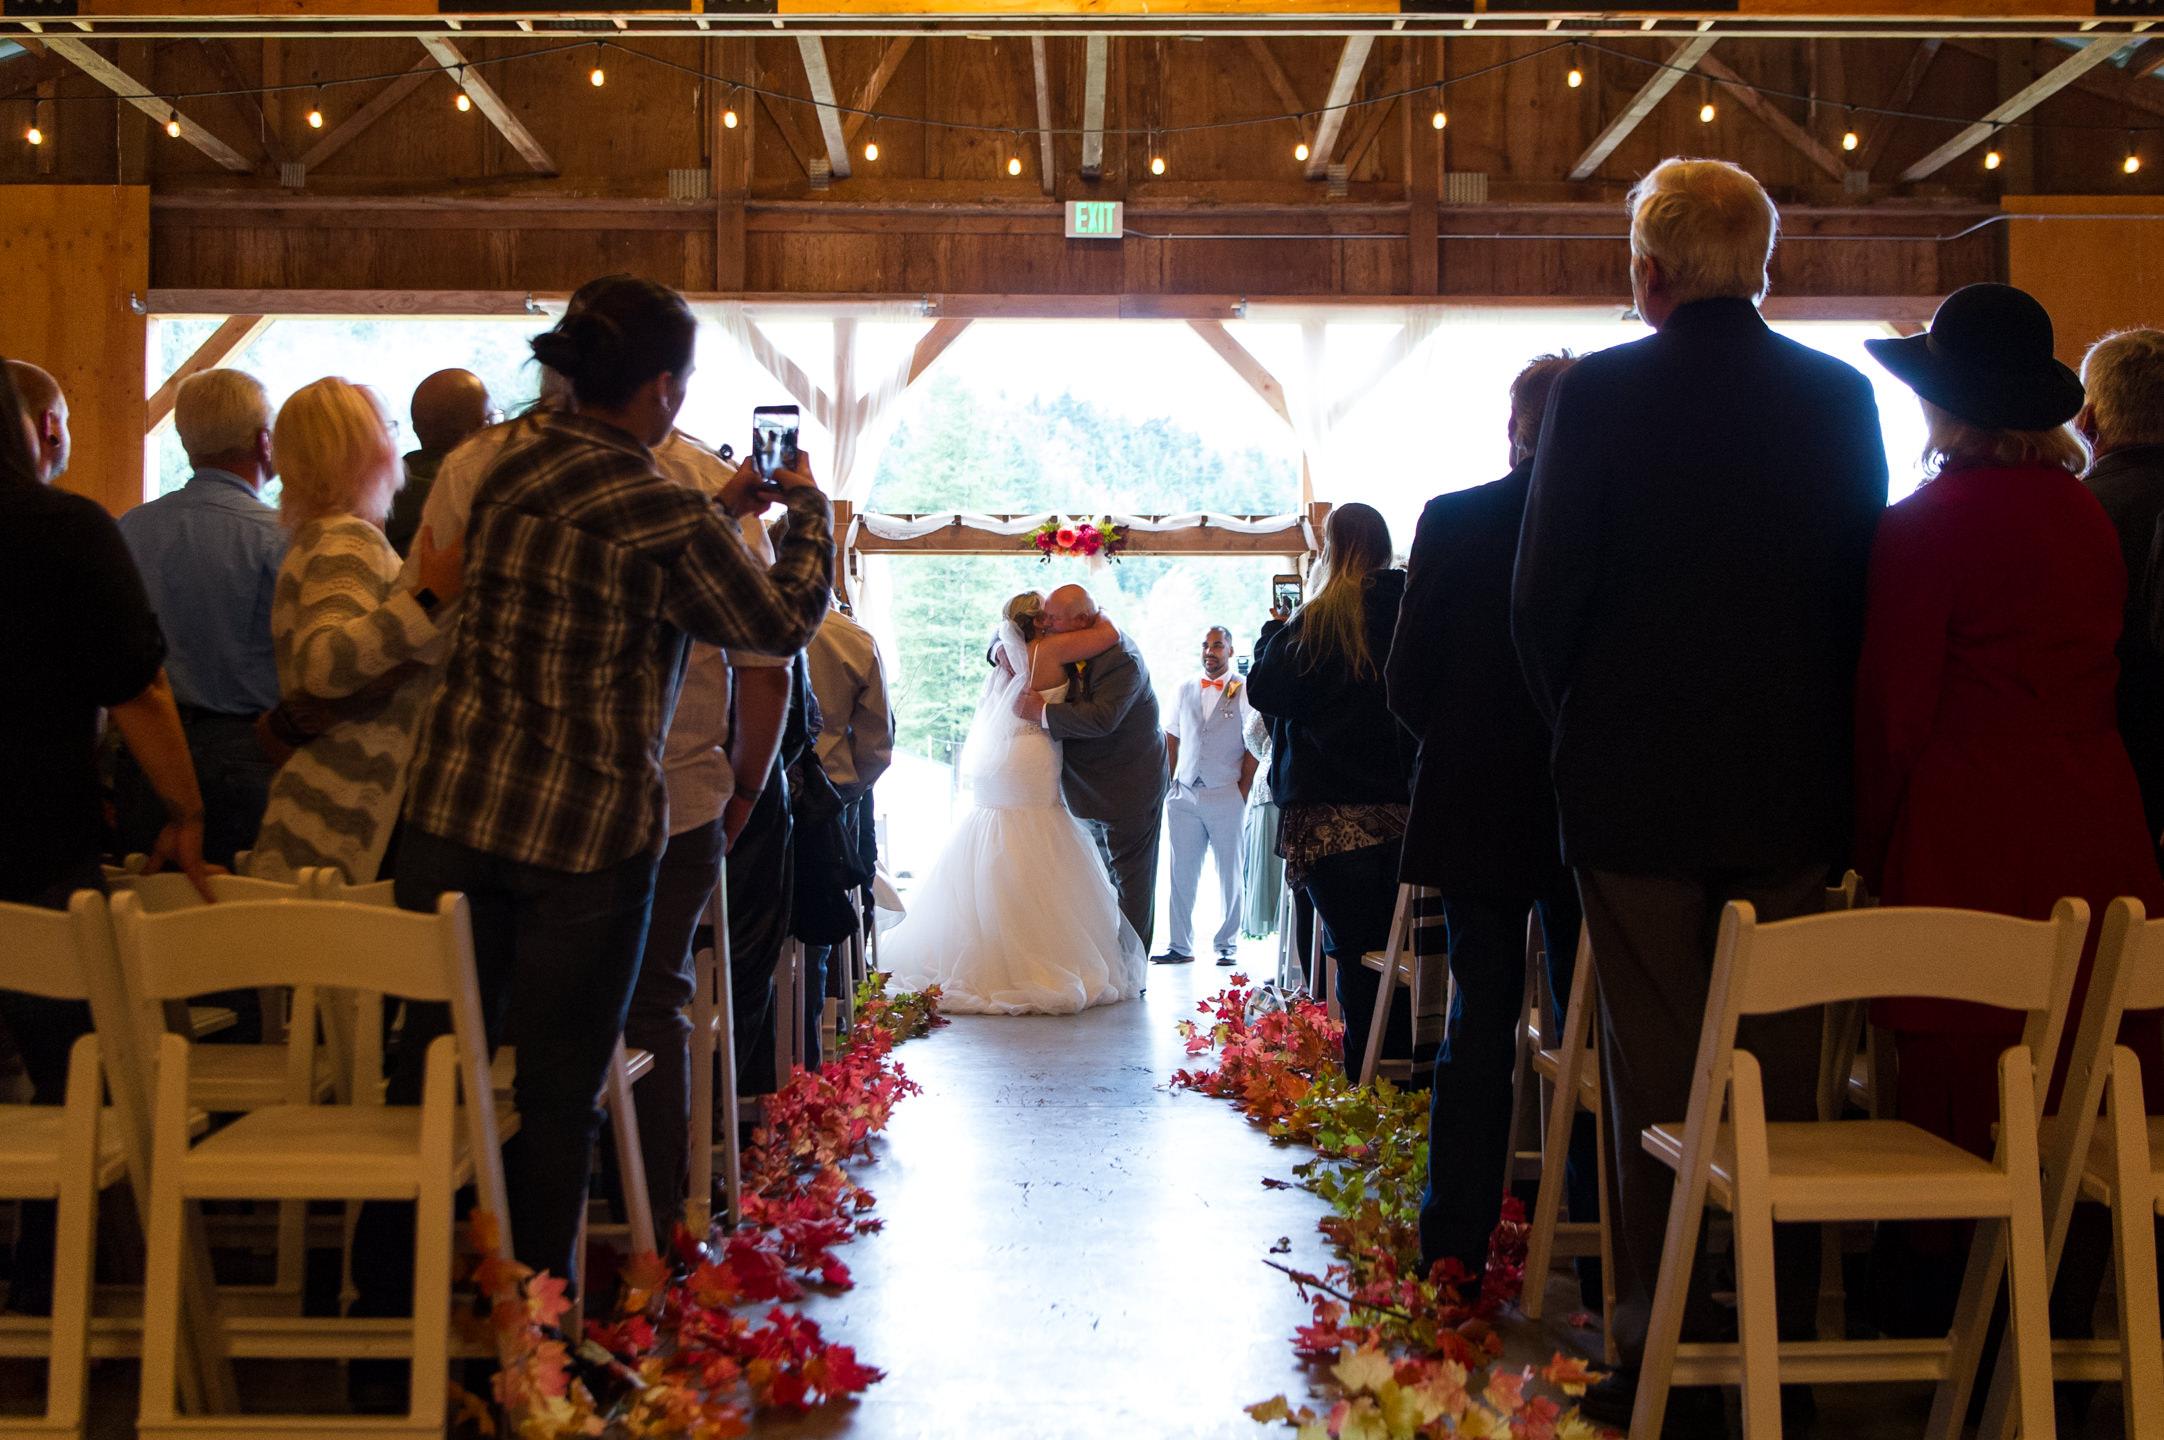 20160917_Tat_Renee and Marcus Wedding-43.jpg